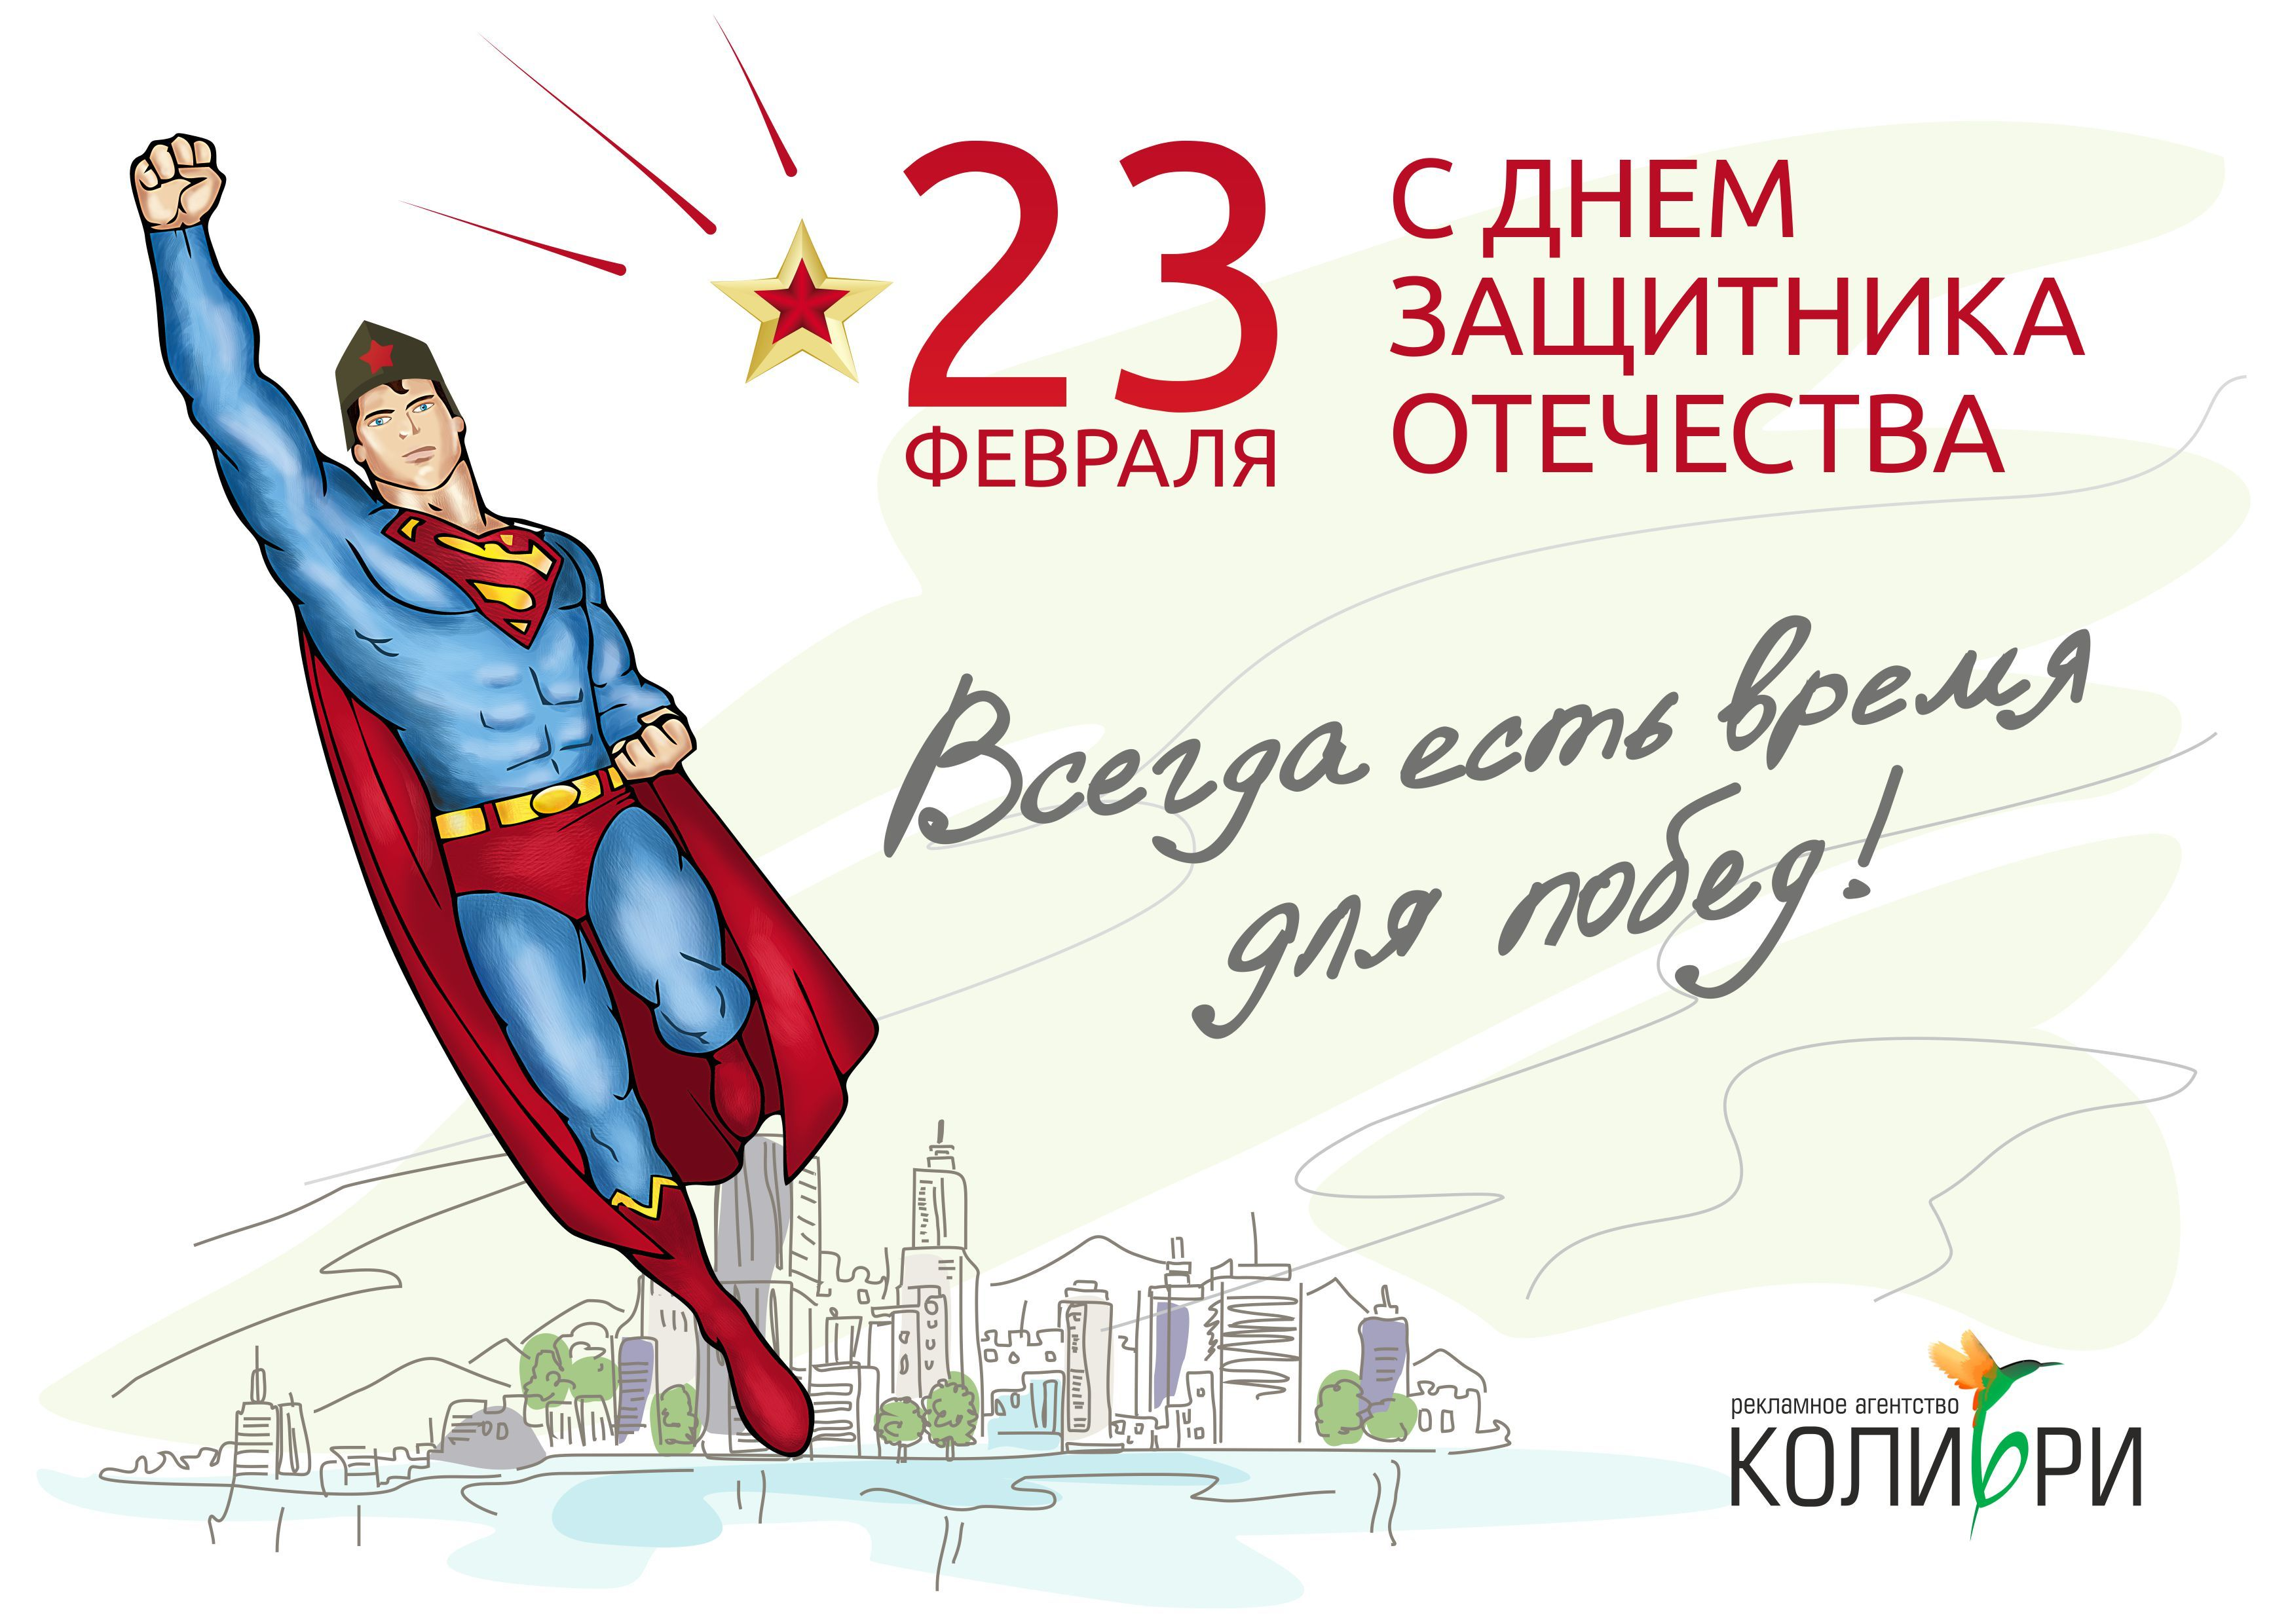 С днем защитника отечества! С 23 февраля!